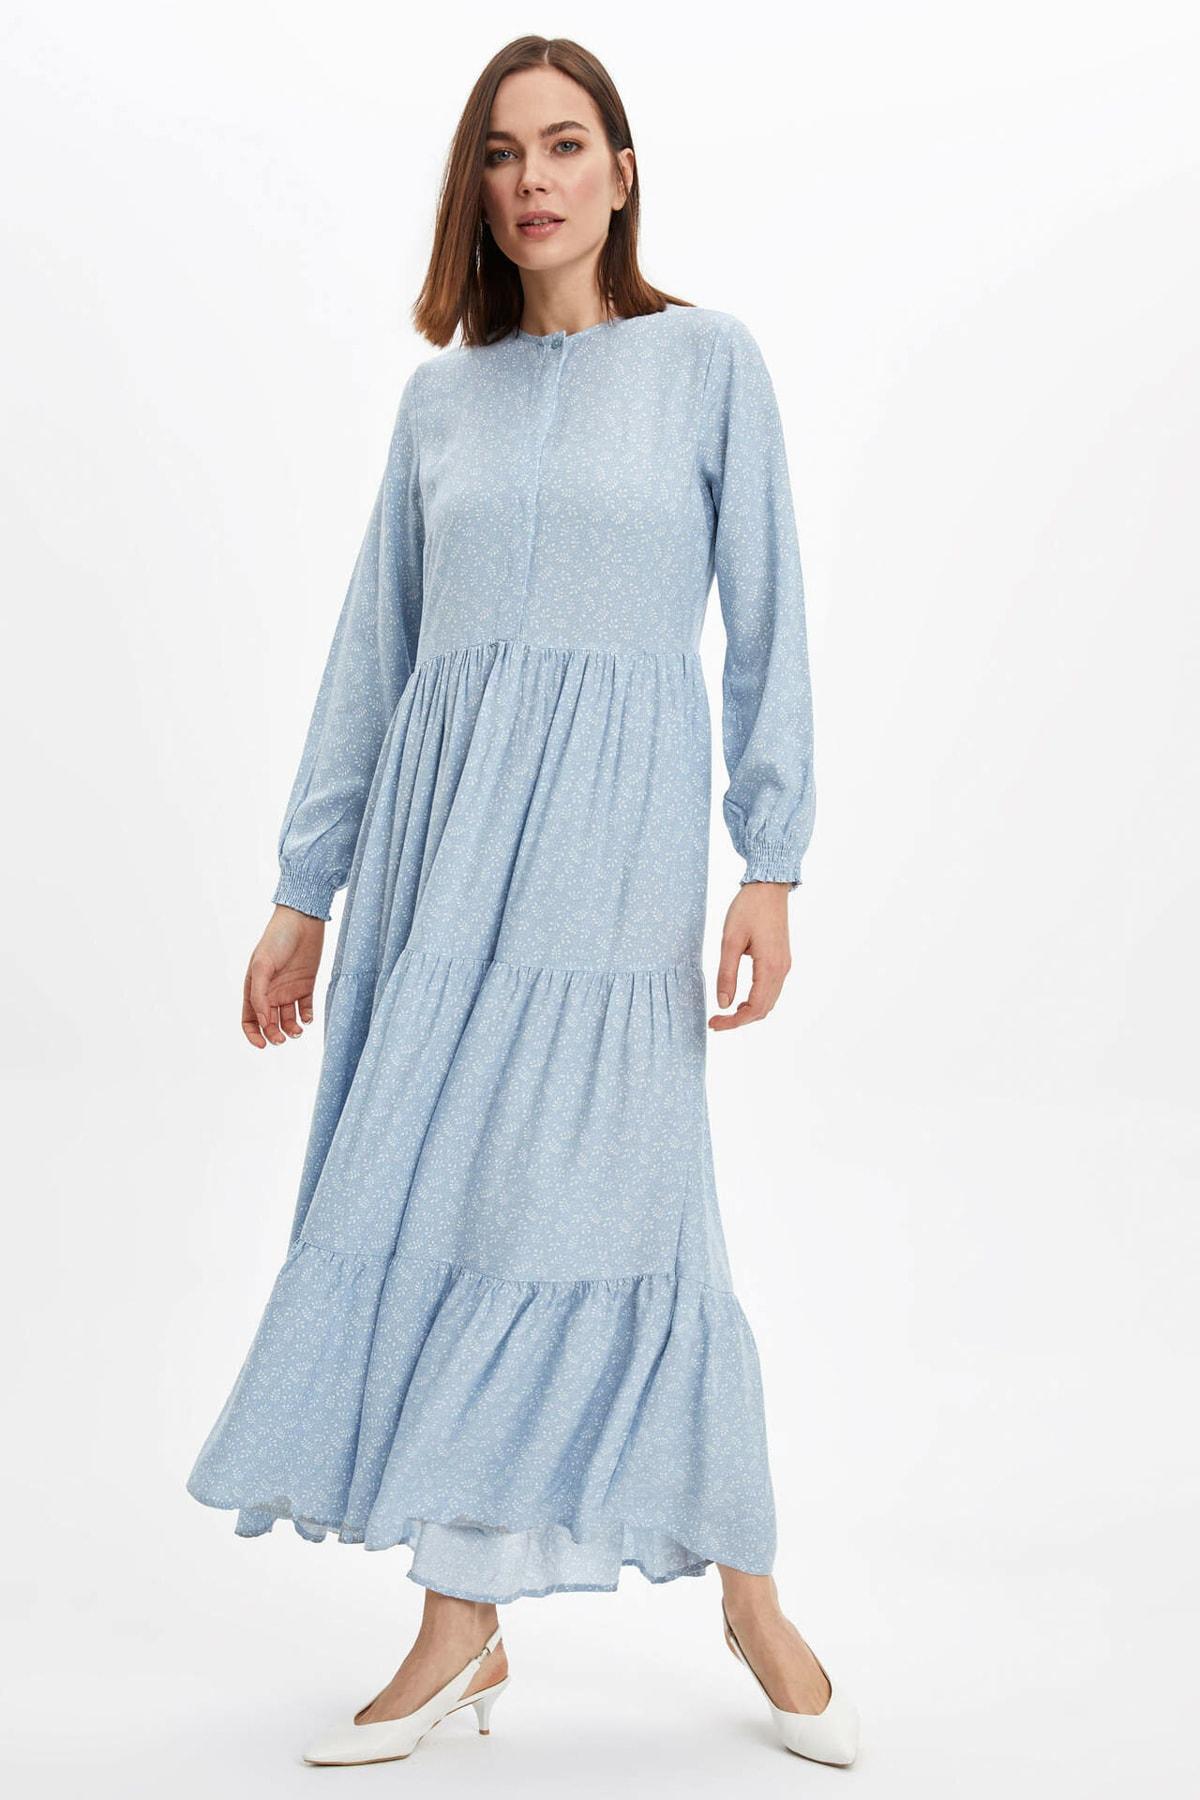 Kadın Mavi Kol Detaylı Dokuma Elbise N0361AZ.20SP.BE524